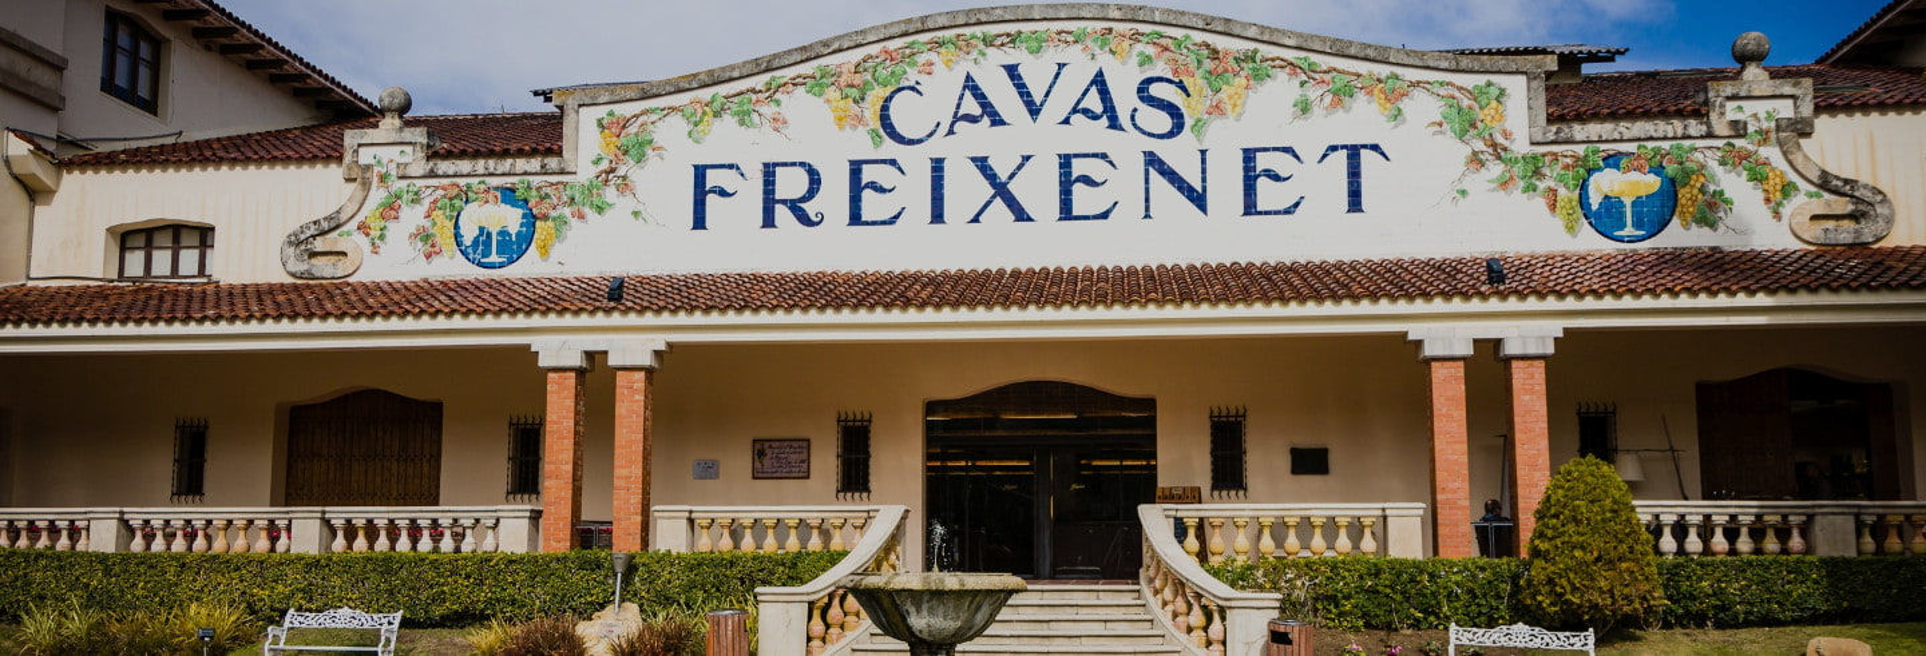 Freixenet Winery Tour